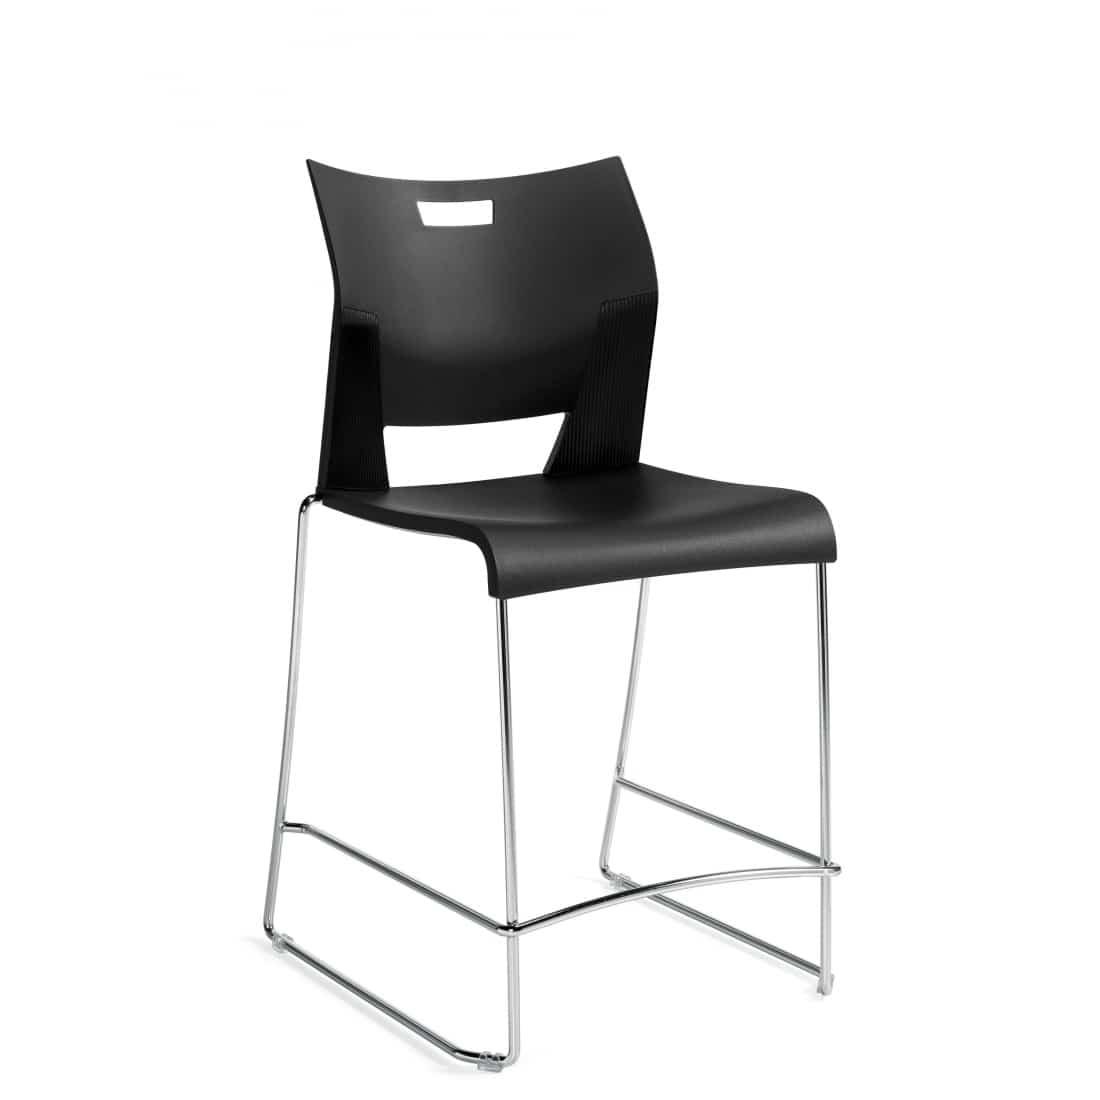 Armless Counter Stool, Black Polypropylene Seat & Back With Chrome Frame (6661)